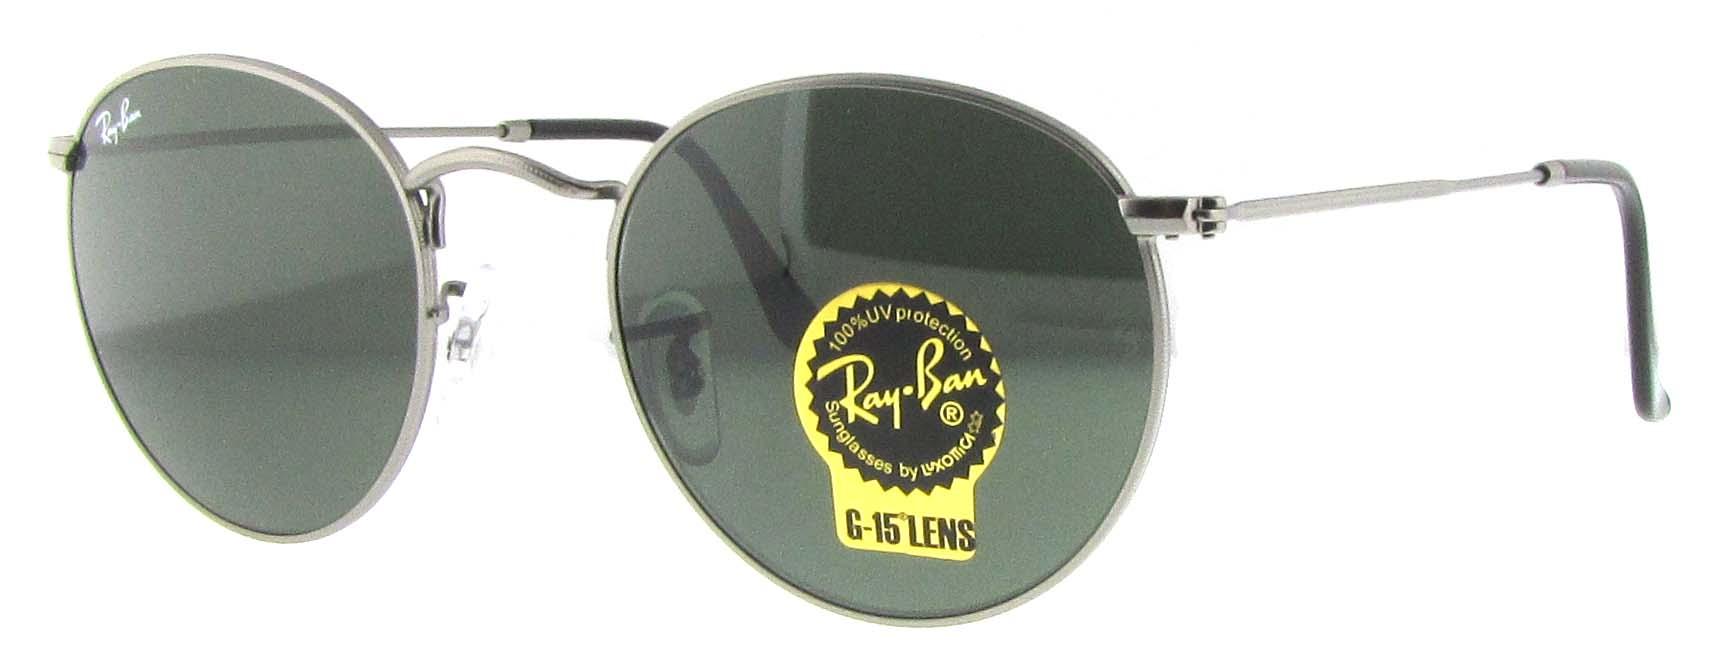 caa3a57d74d Ray Ban Rb 3447 Round Metal Sunglasses 50mm Gun